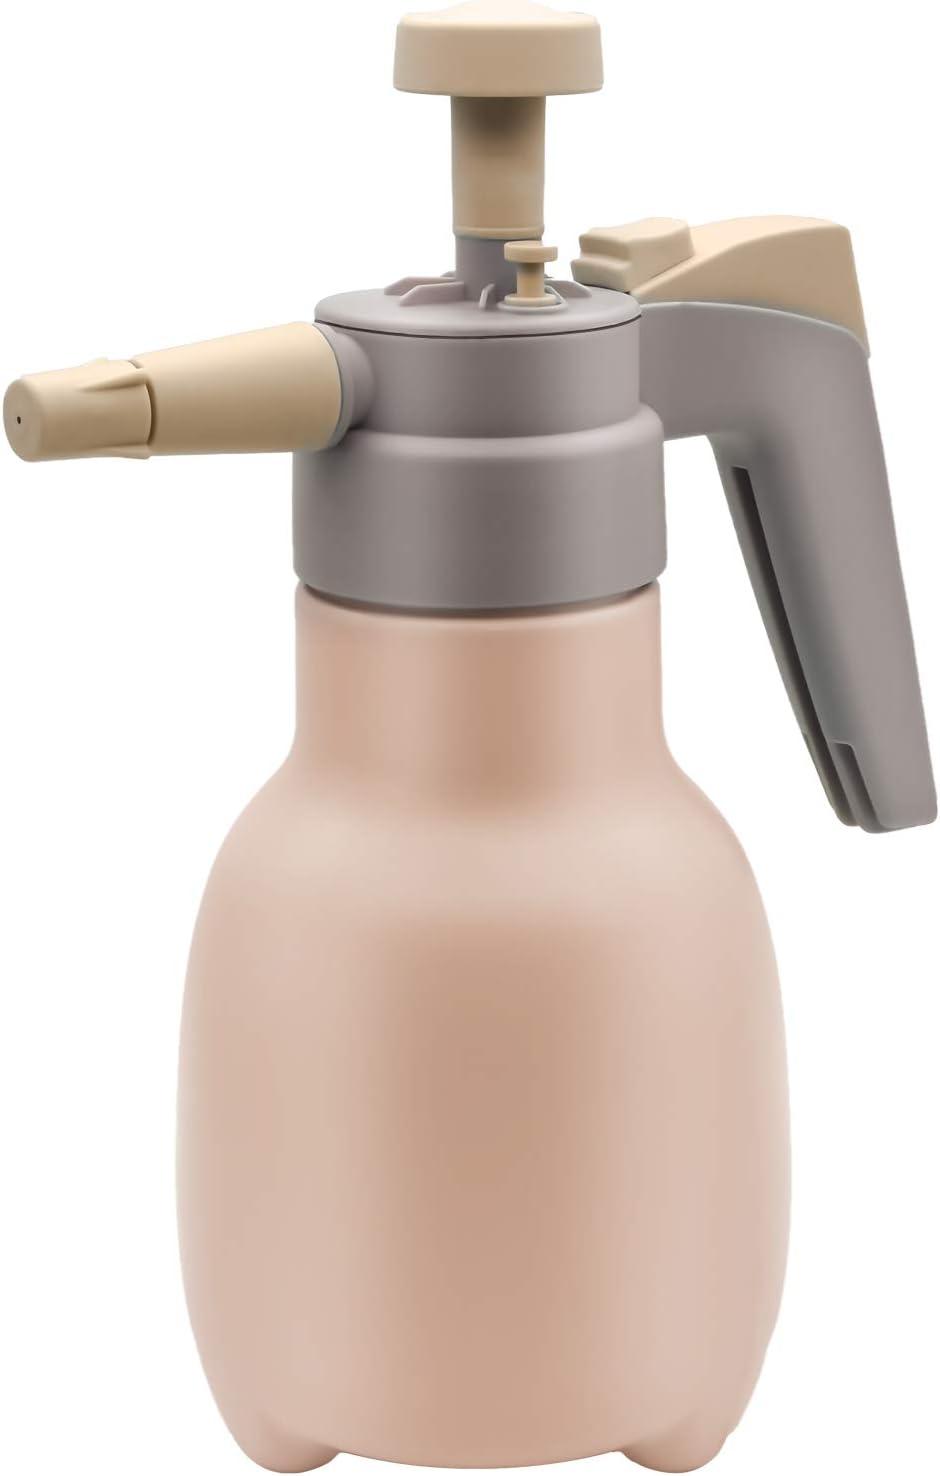 FEEMIC trust Garden All stores are sold Sprayer Pump Water Sprayers Pressure Hand